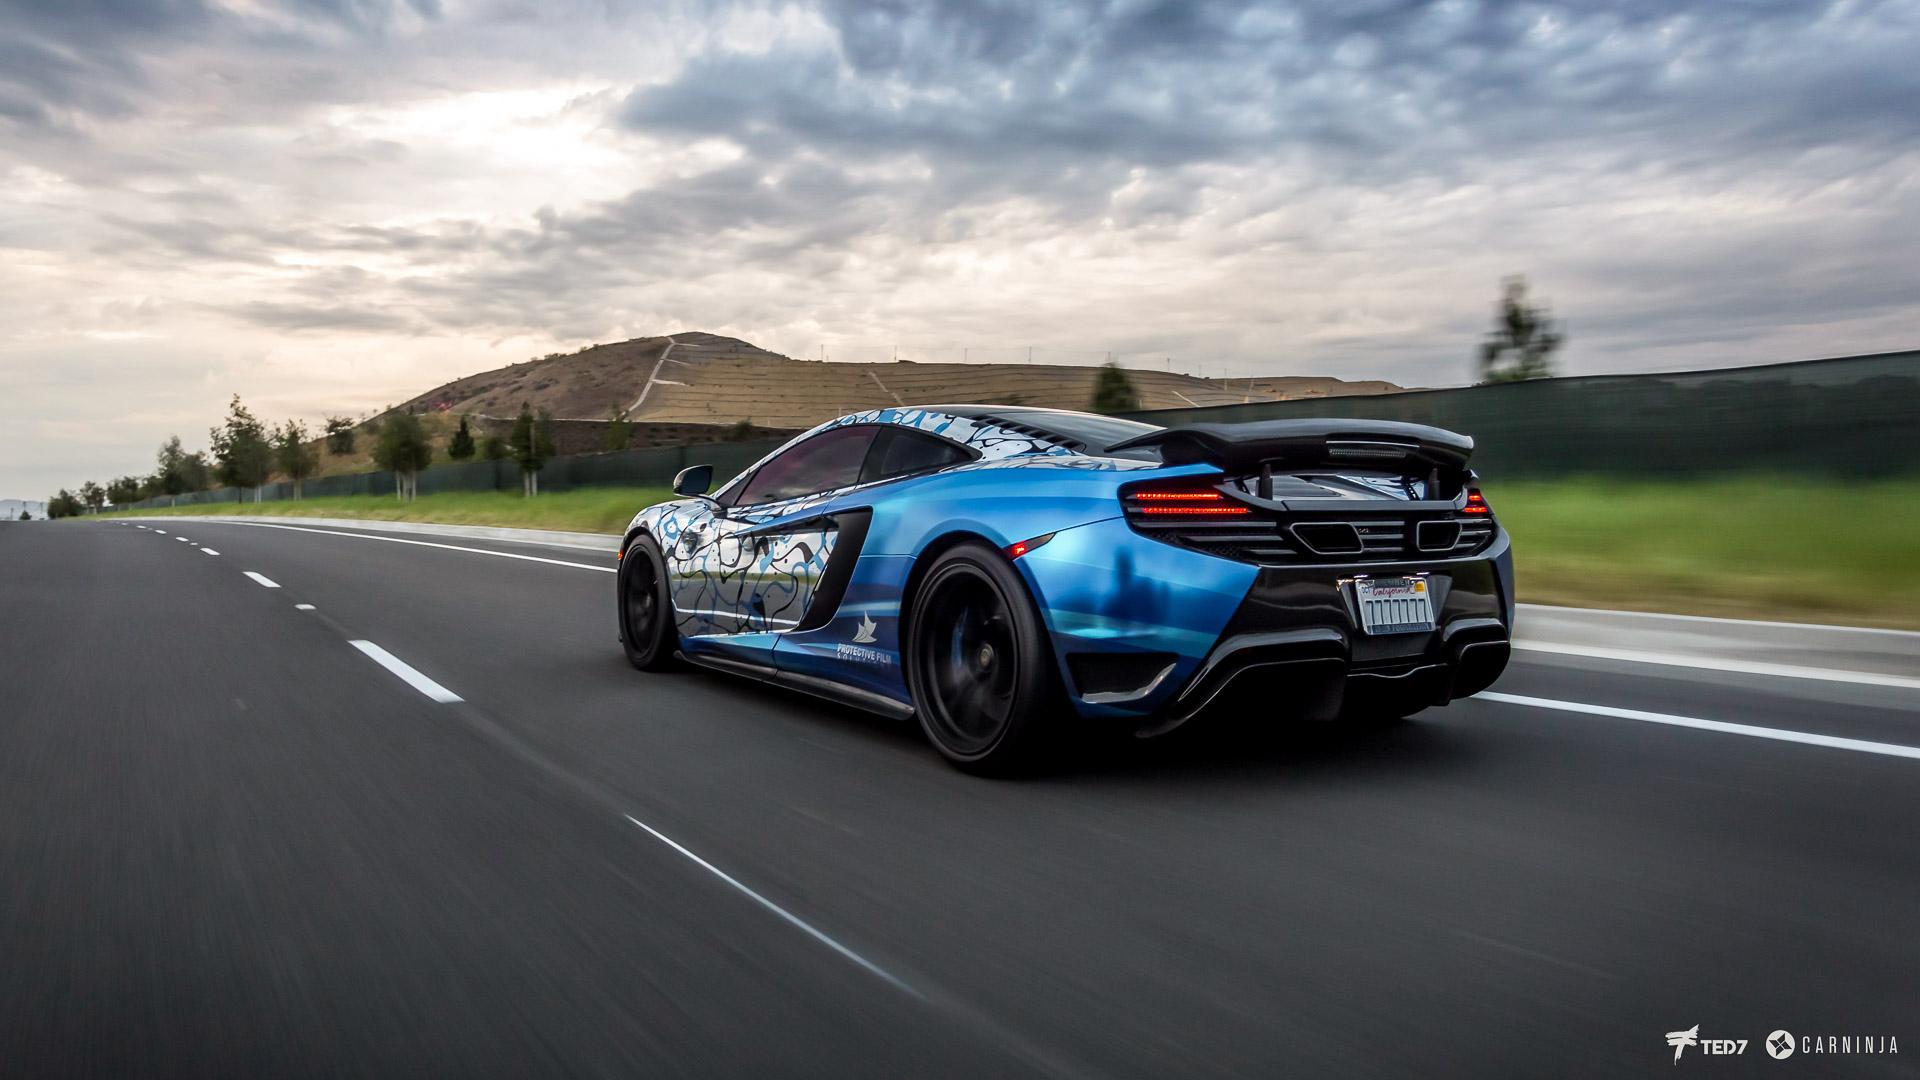 McLaren 12C Rolling Shot - Vehicle Wraps